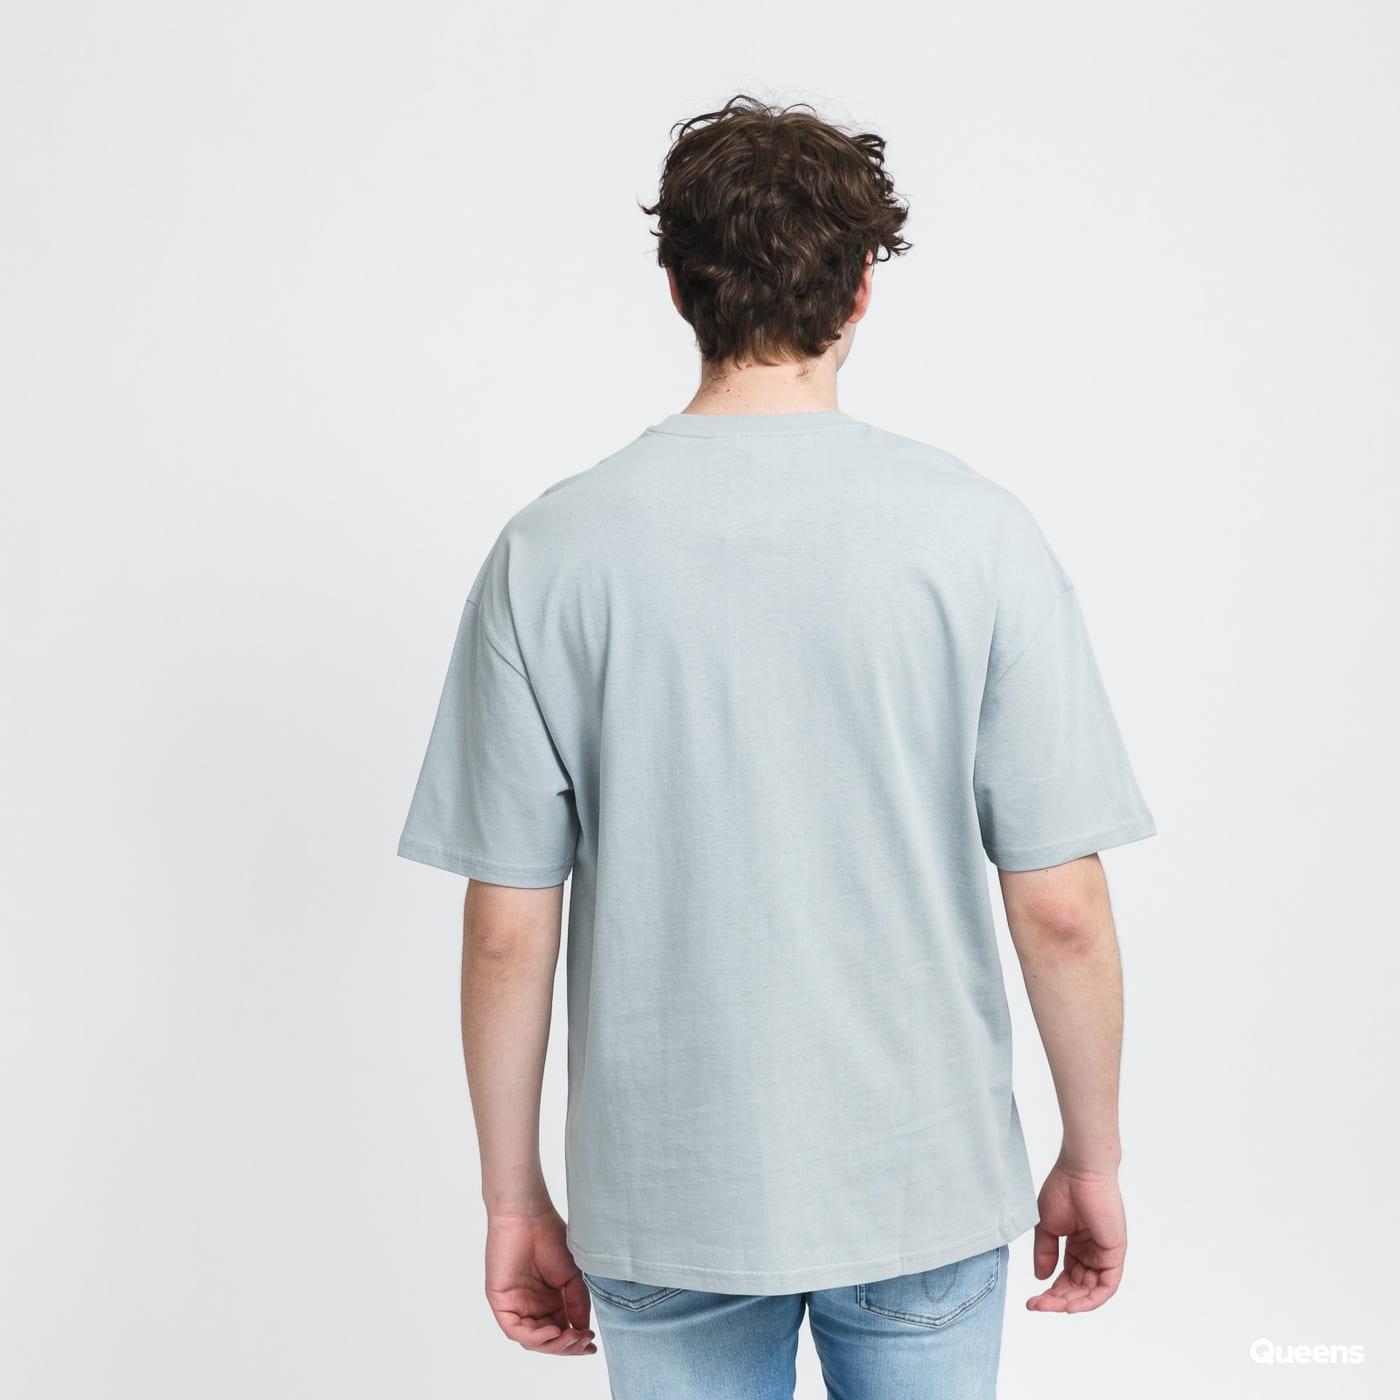 9N1M SENSE. Logo T-shirt gray